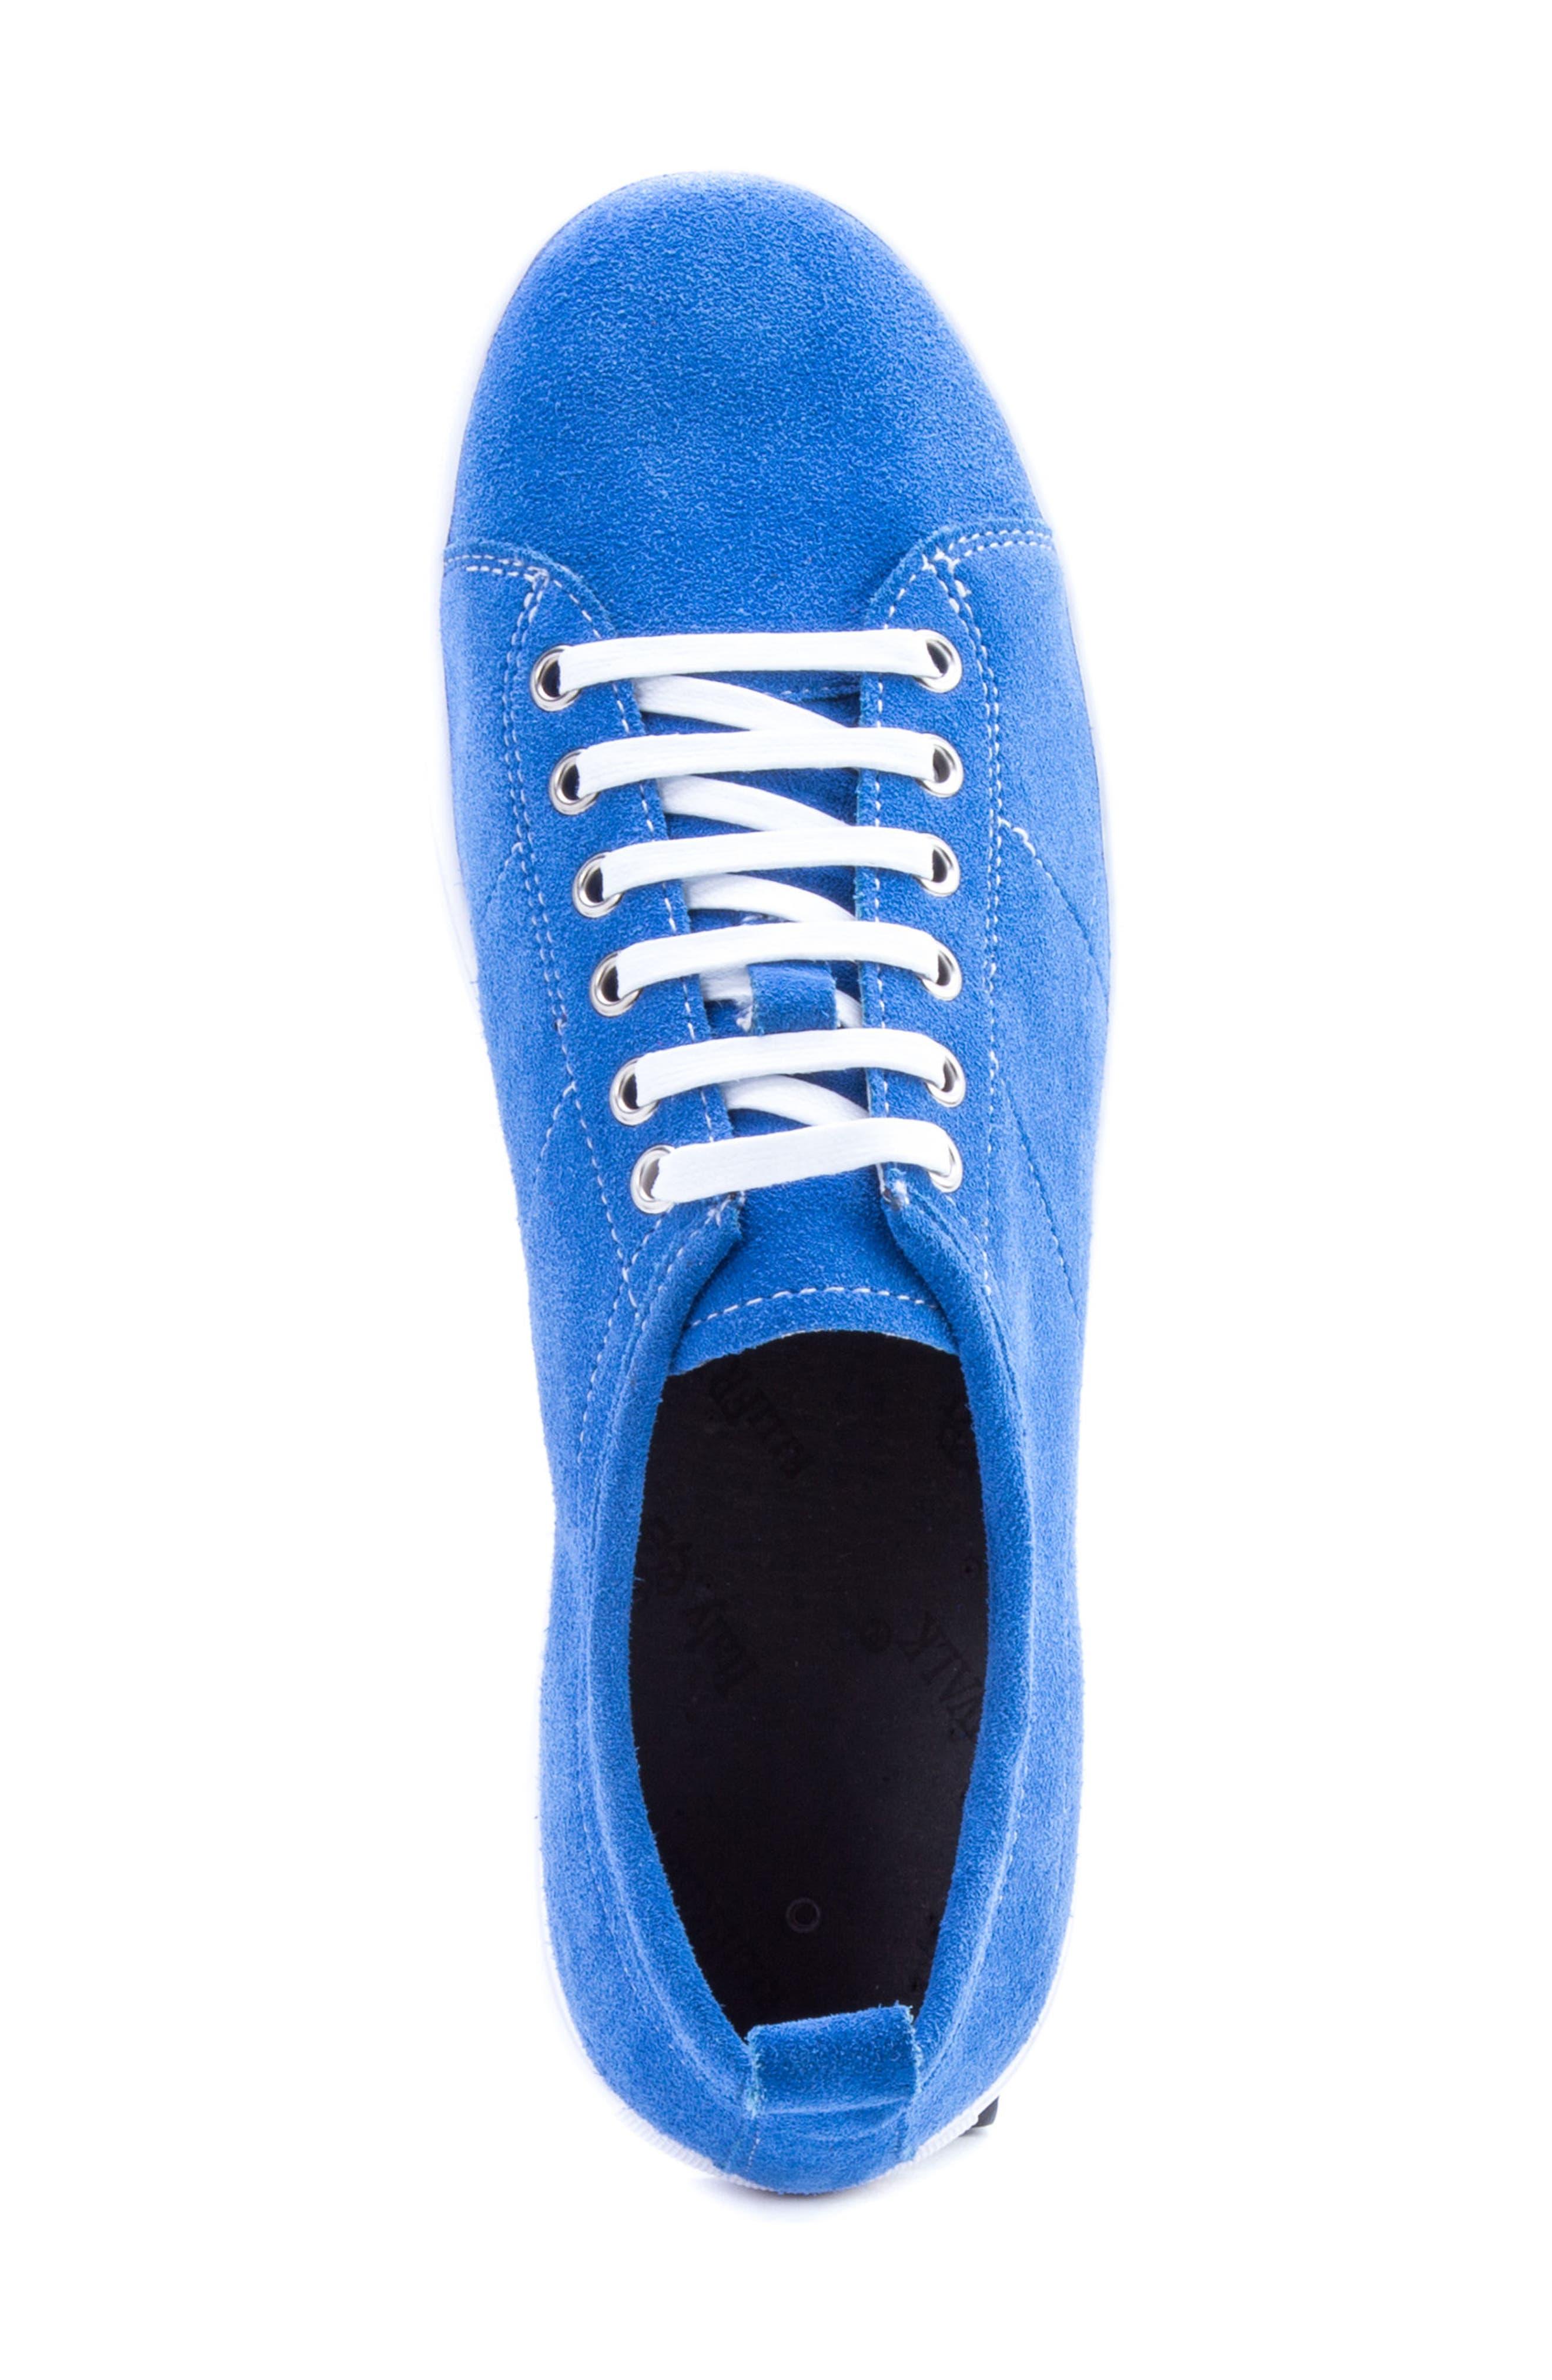 Ernesto Low Top Sneaker,                             Alternate thumbnail 5, color,                             ROYAL SUEDE